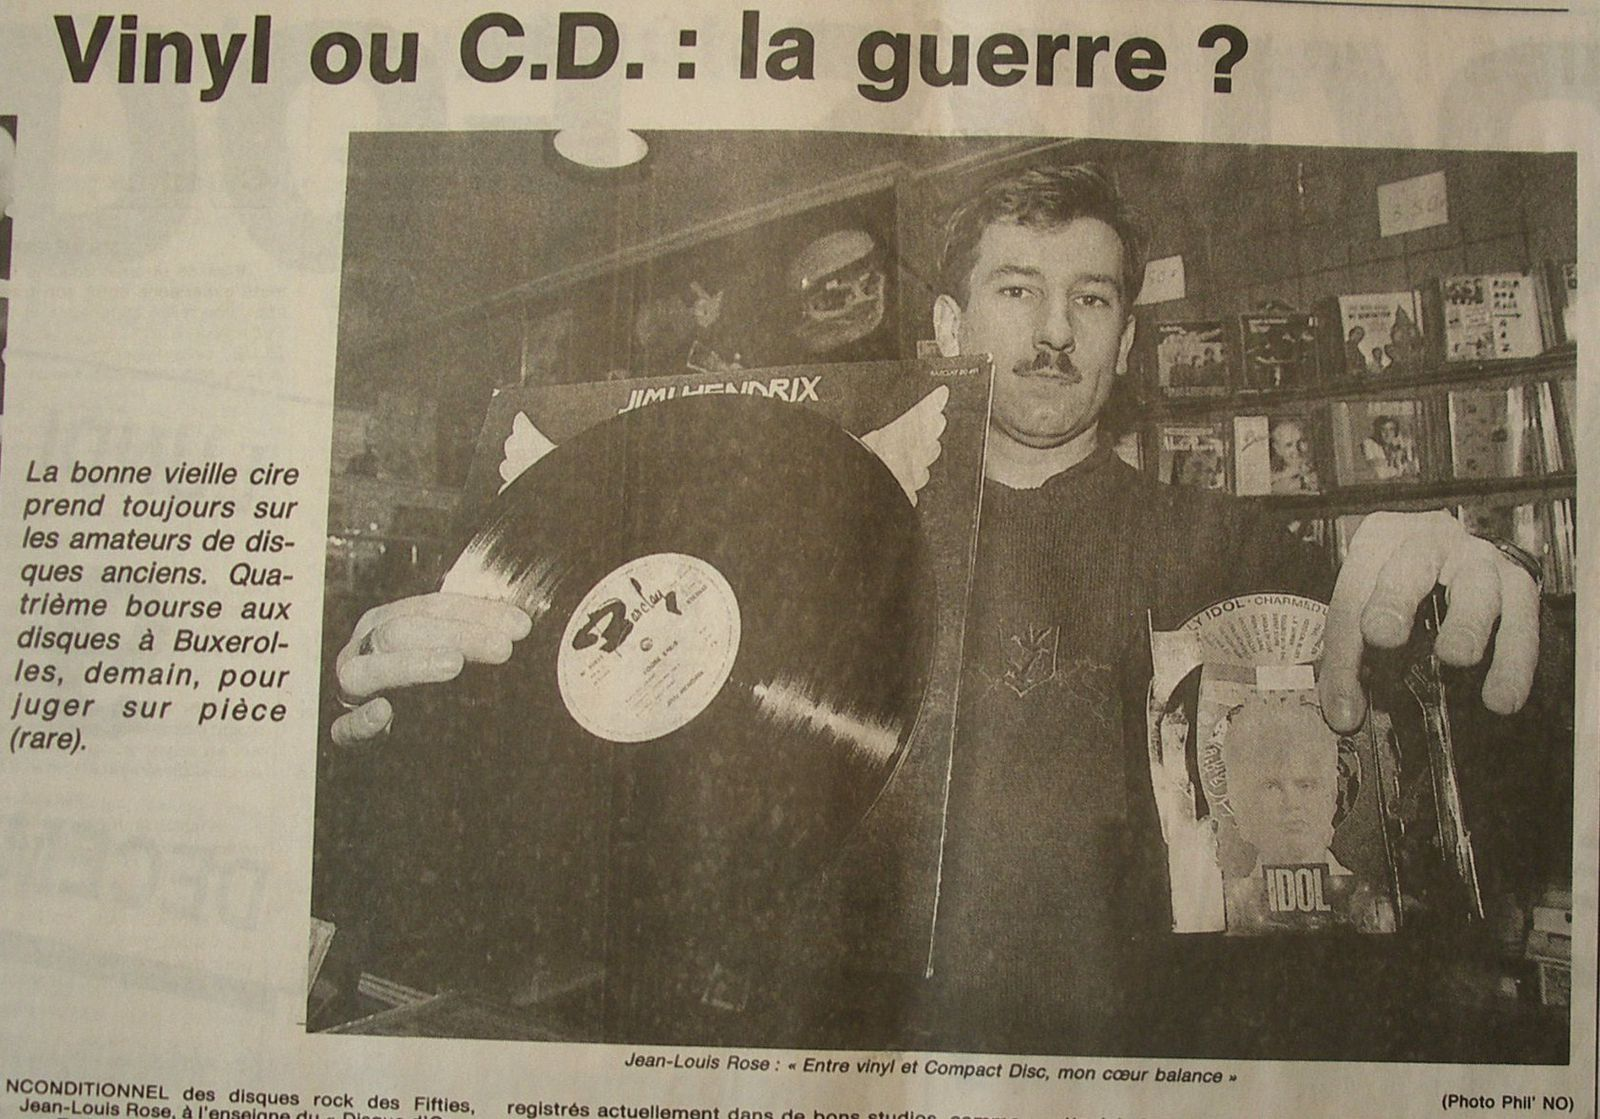 VINYL-CD-la-guerre.JPG